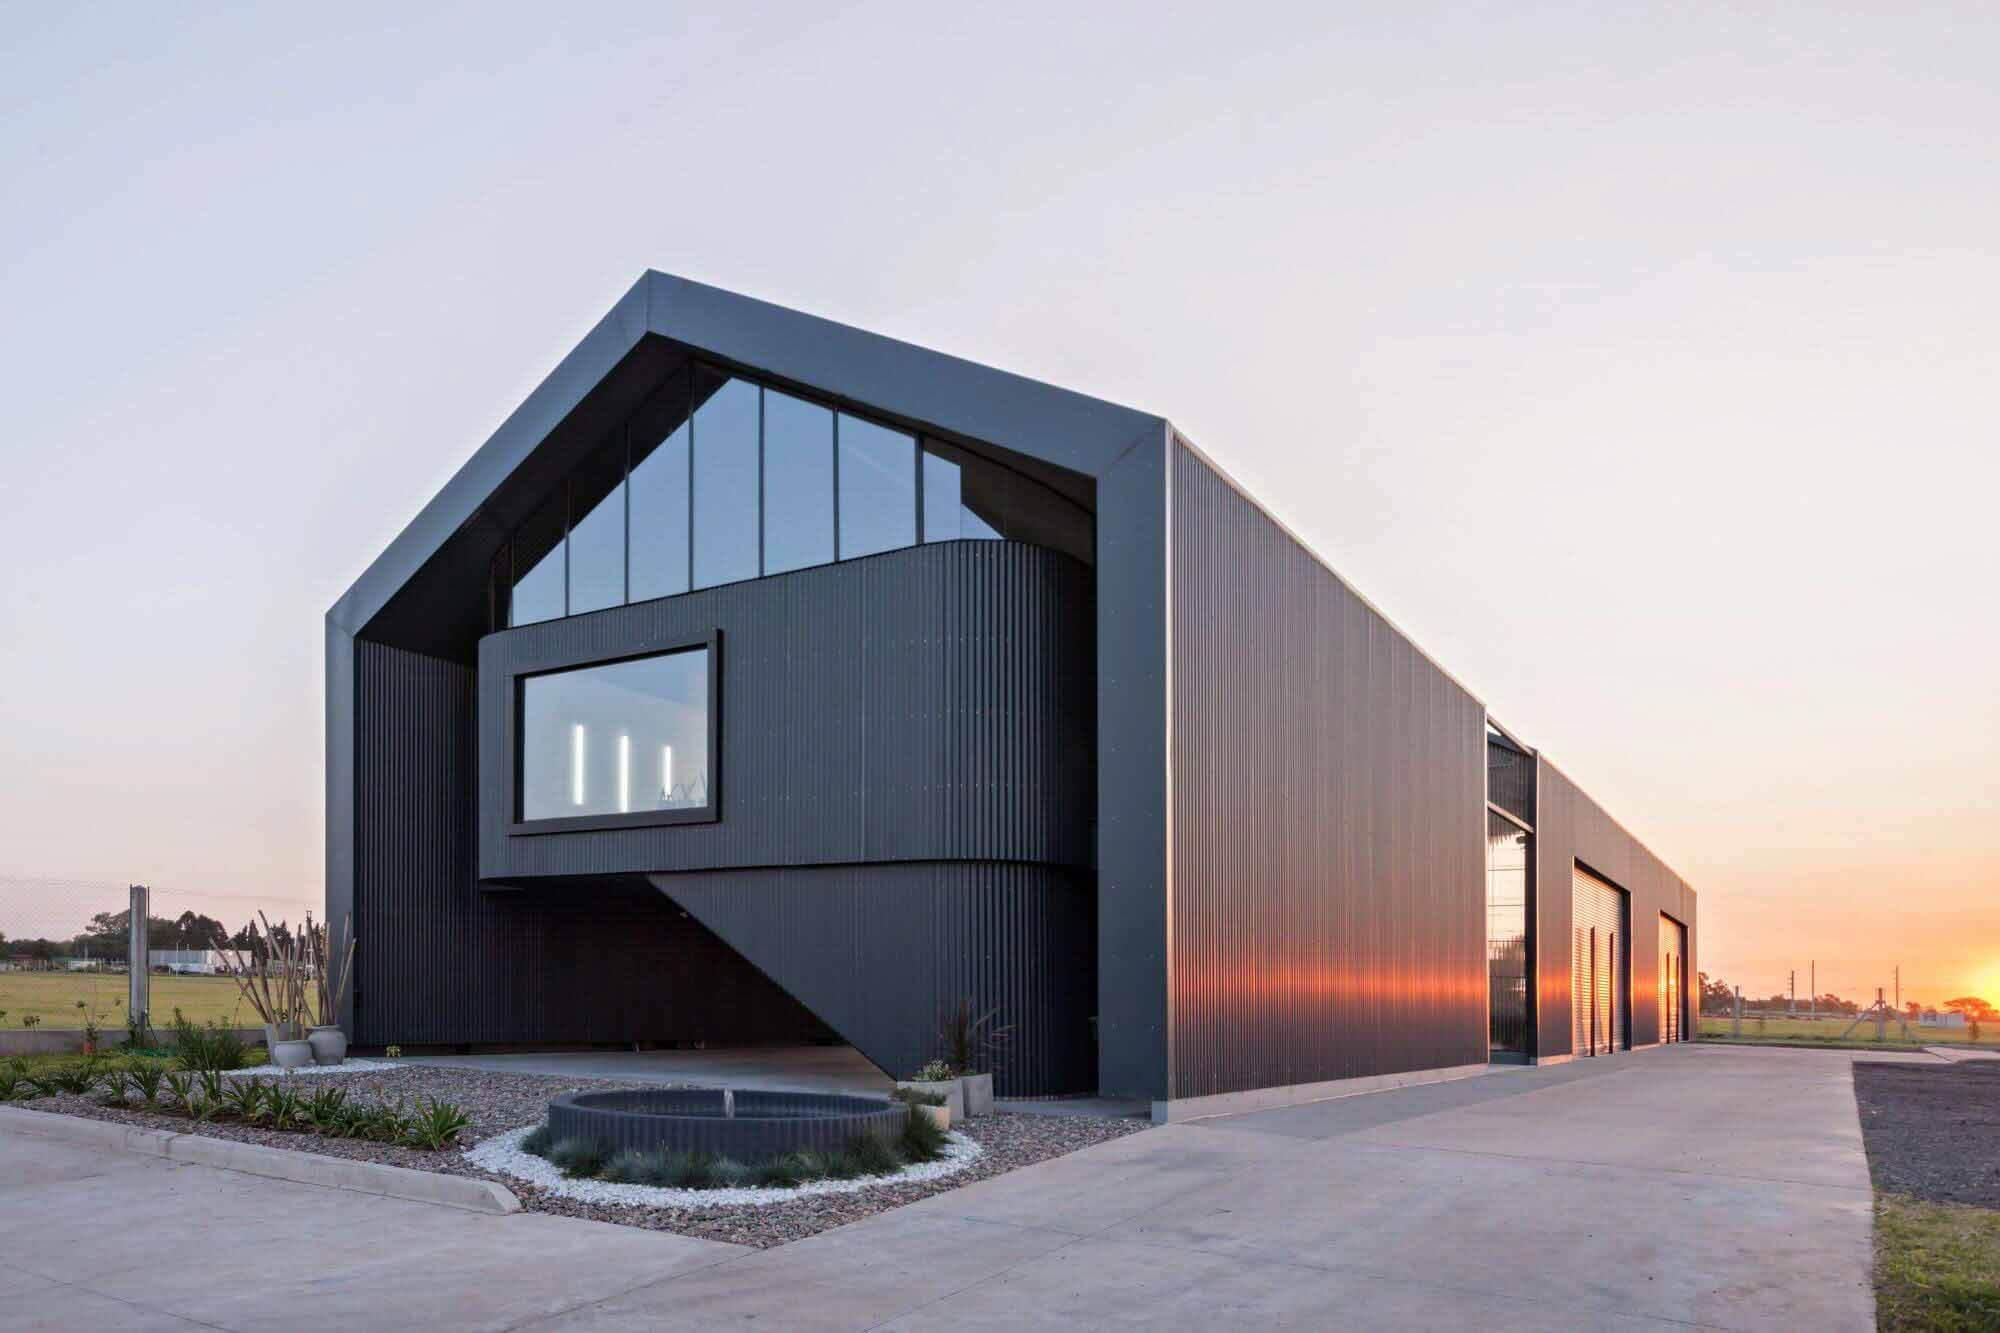 Bertolotti Vial Machinery and Office Warehouse / Estudio 2 (A) DosArquitectas